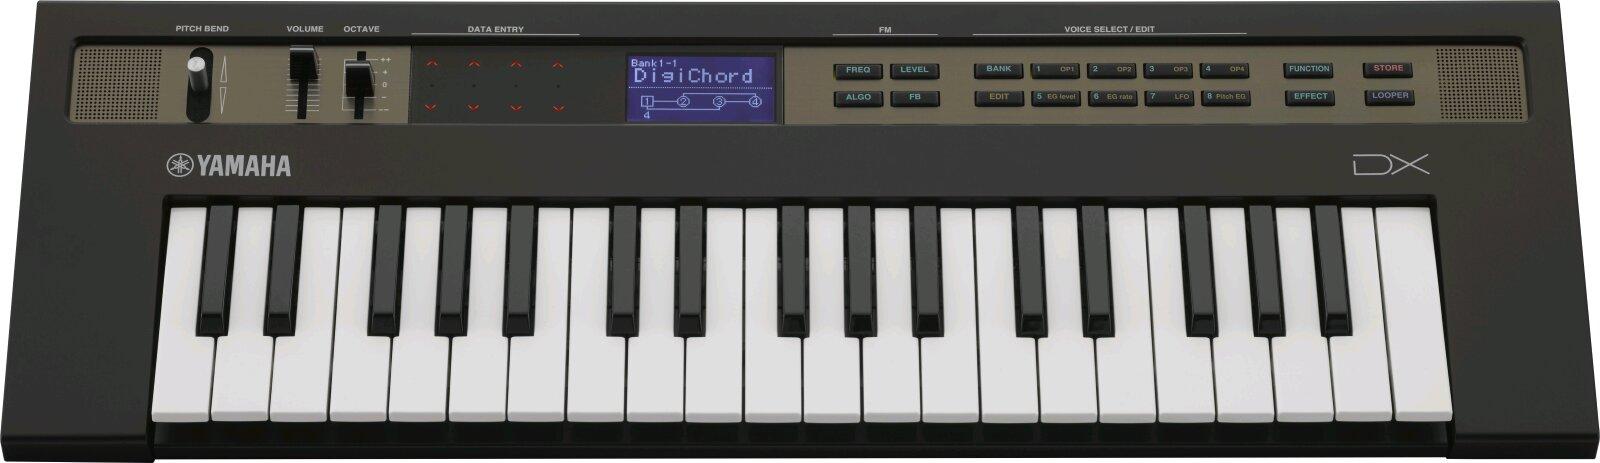 Yamaha Reface DX Mini keyboard : photo 1